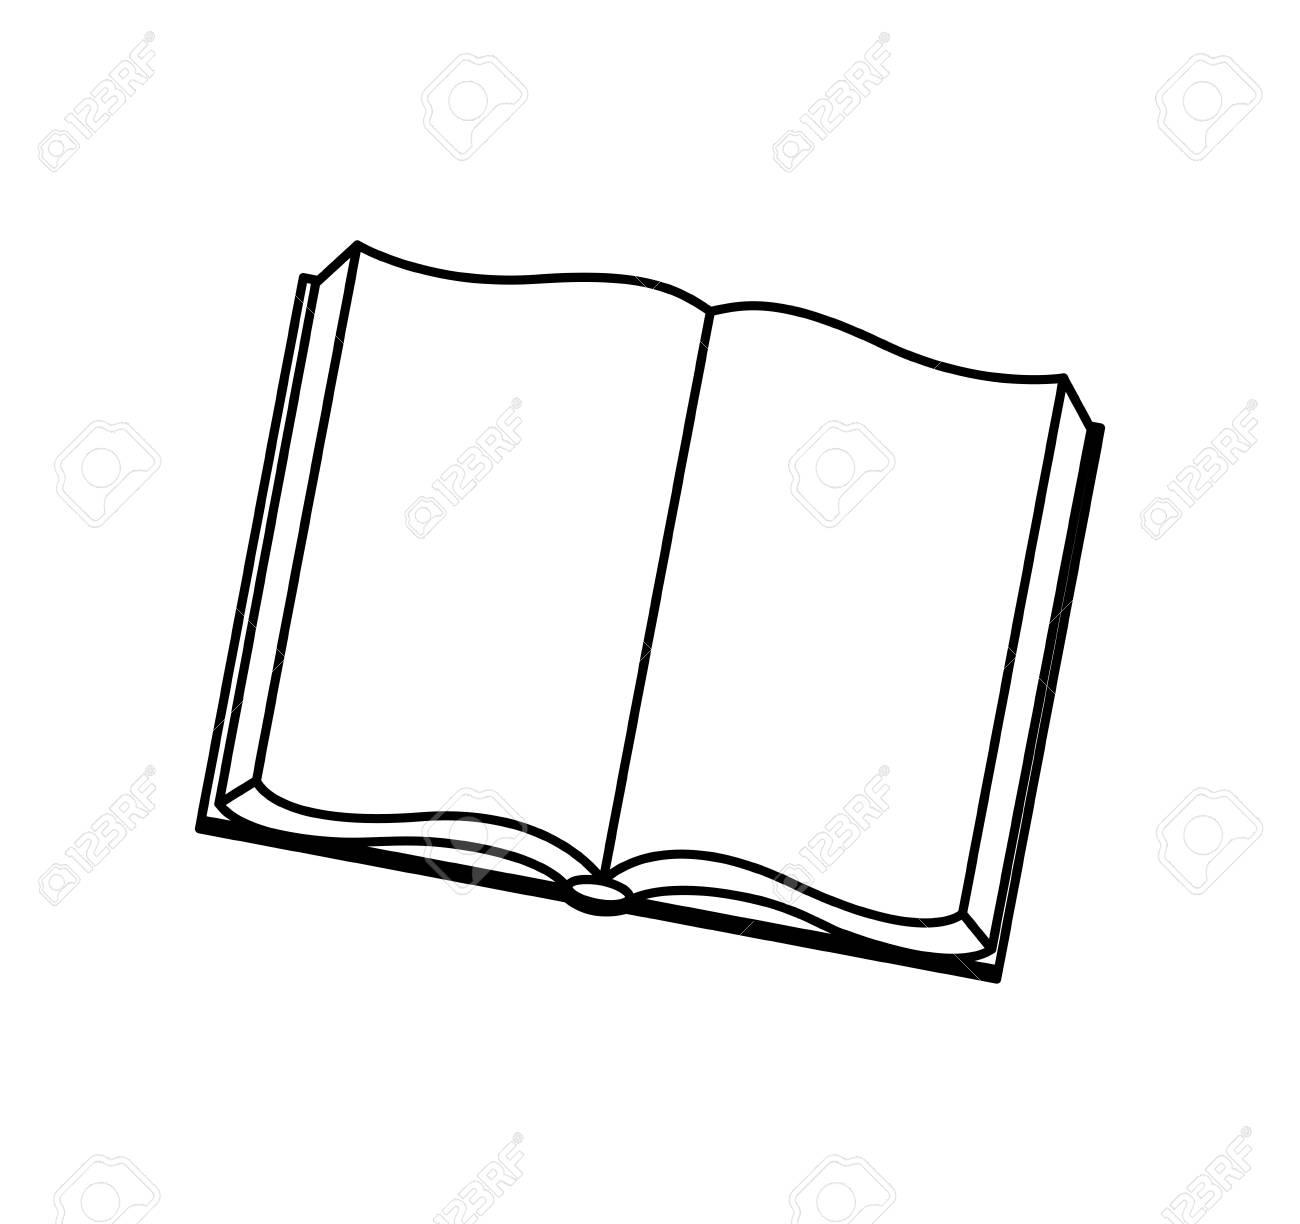 book school isolated icon vector illustration design - 122712030